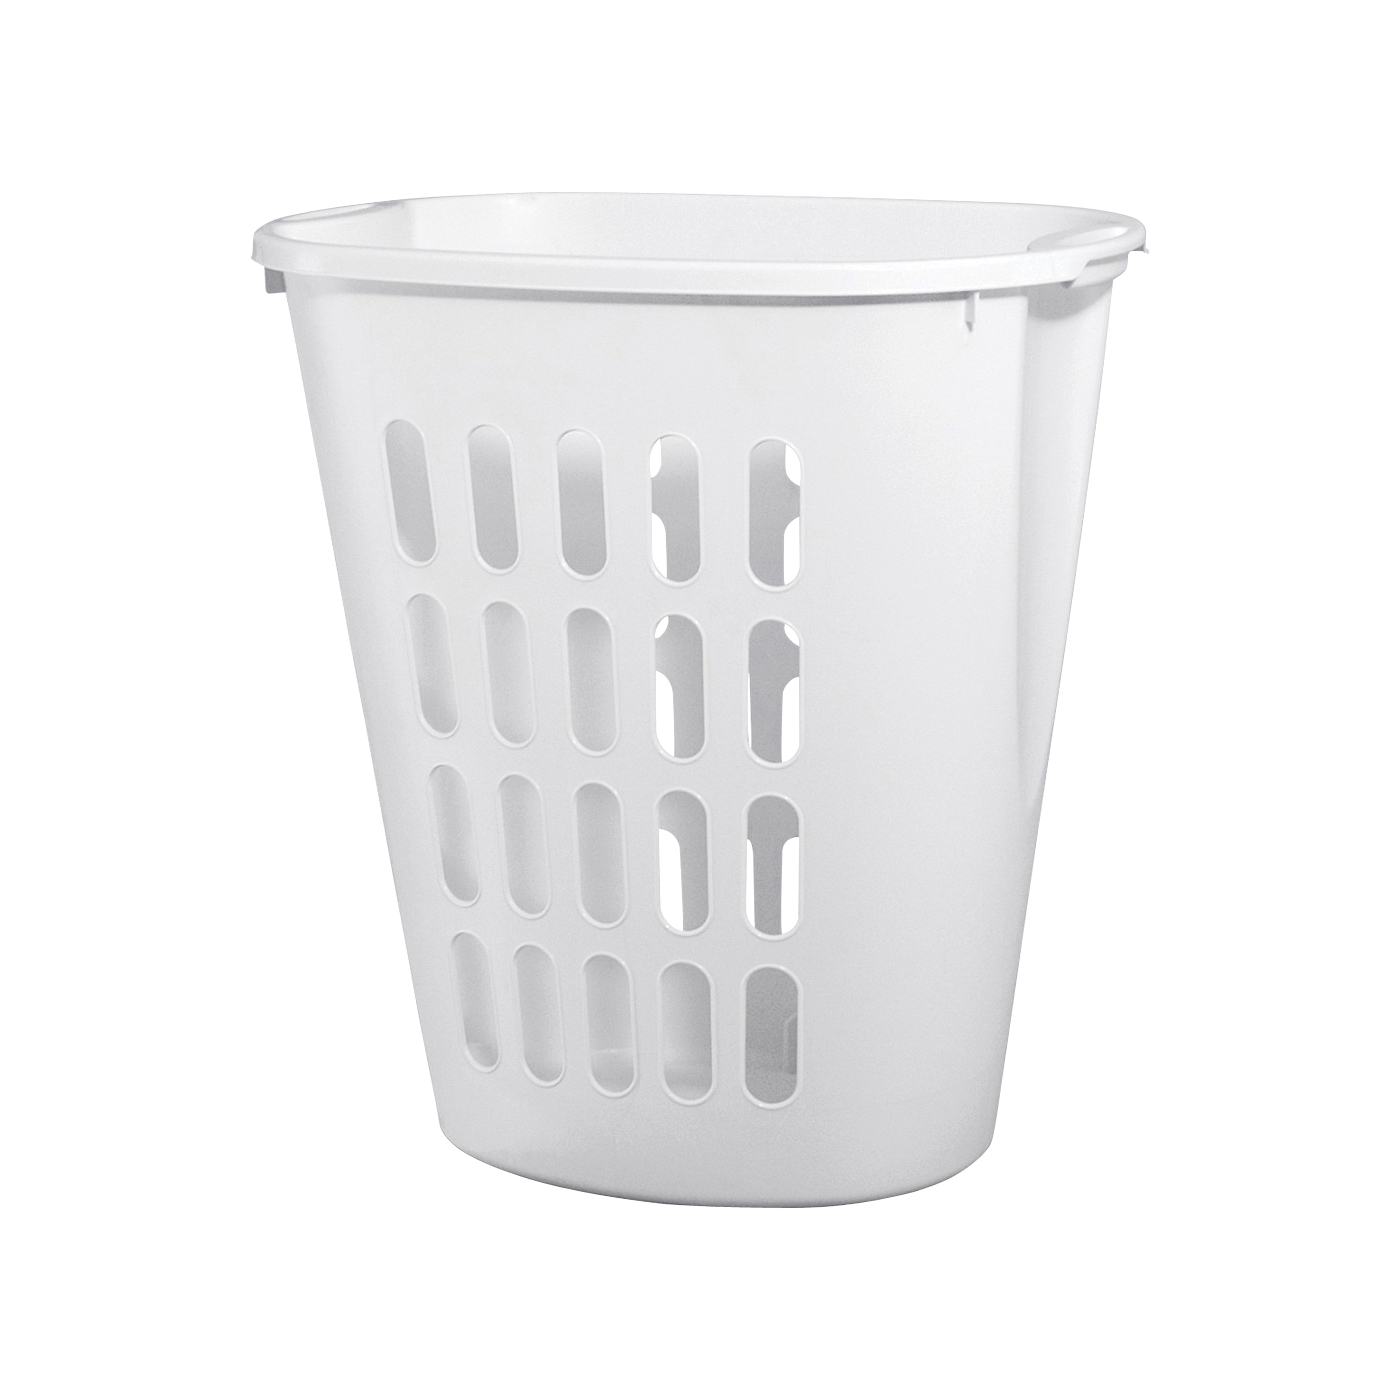 Picture of Sterilite 12568006 Open Laundry Hamper, 2.3 bu Capacity, White, 14-3/8 in W, 21-7/8 in H, 21 in D